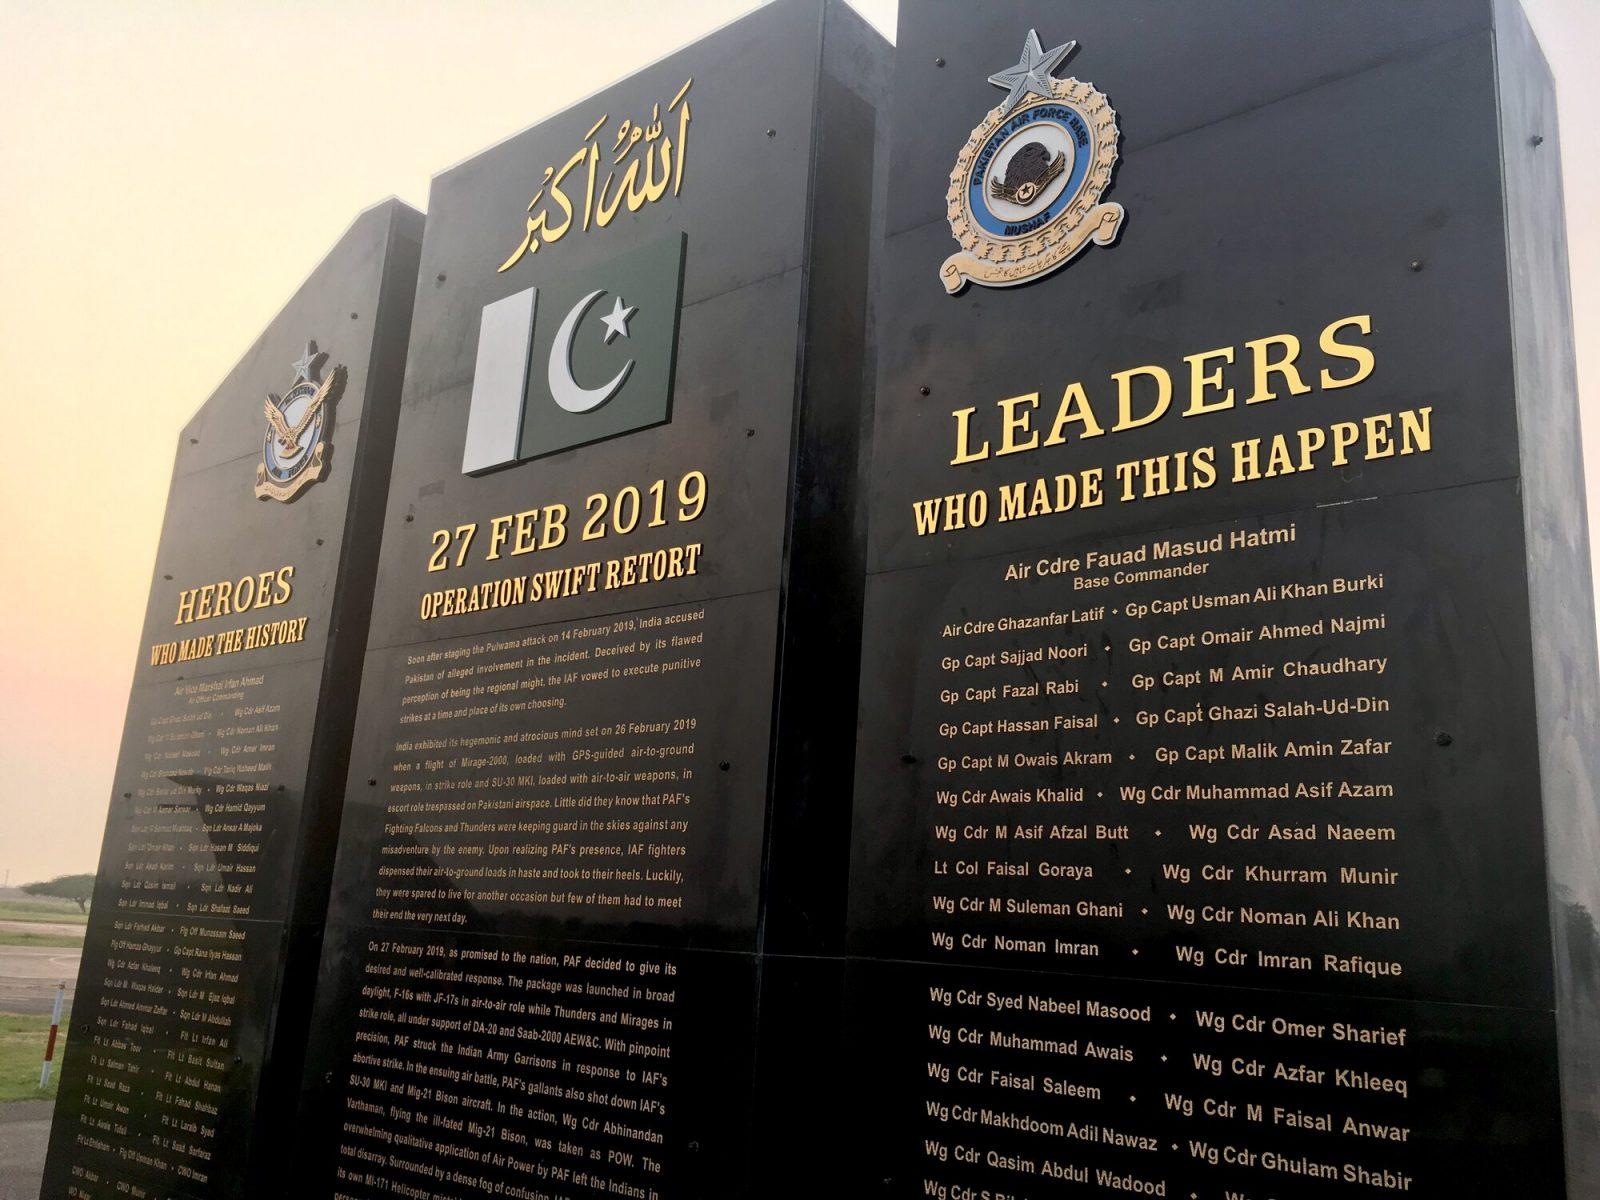 Pakistan Air Force made Operation Swift Retort Memorial at PAF Base Mushaf